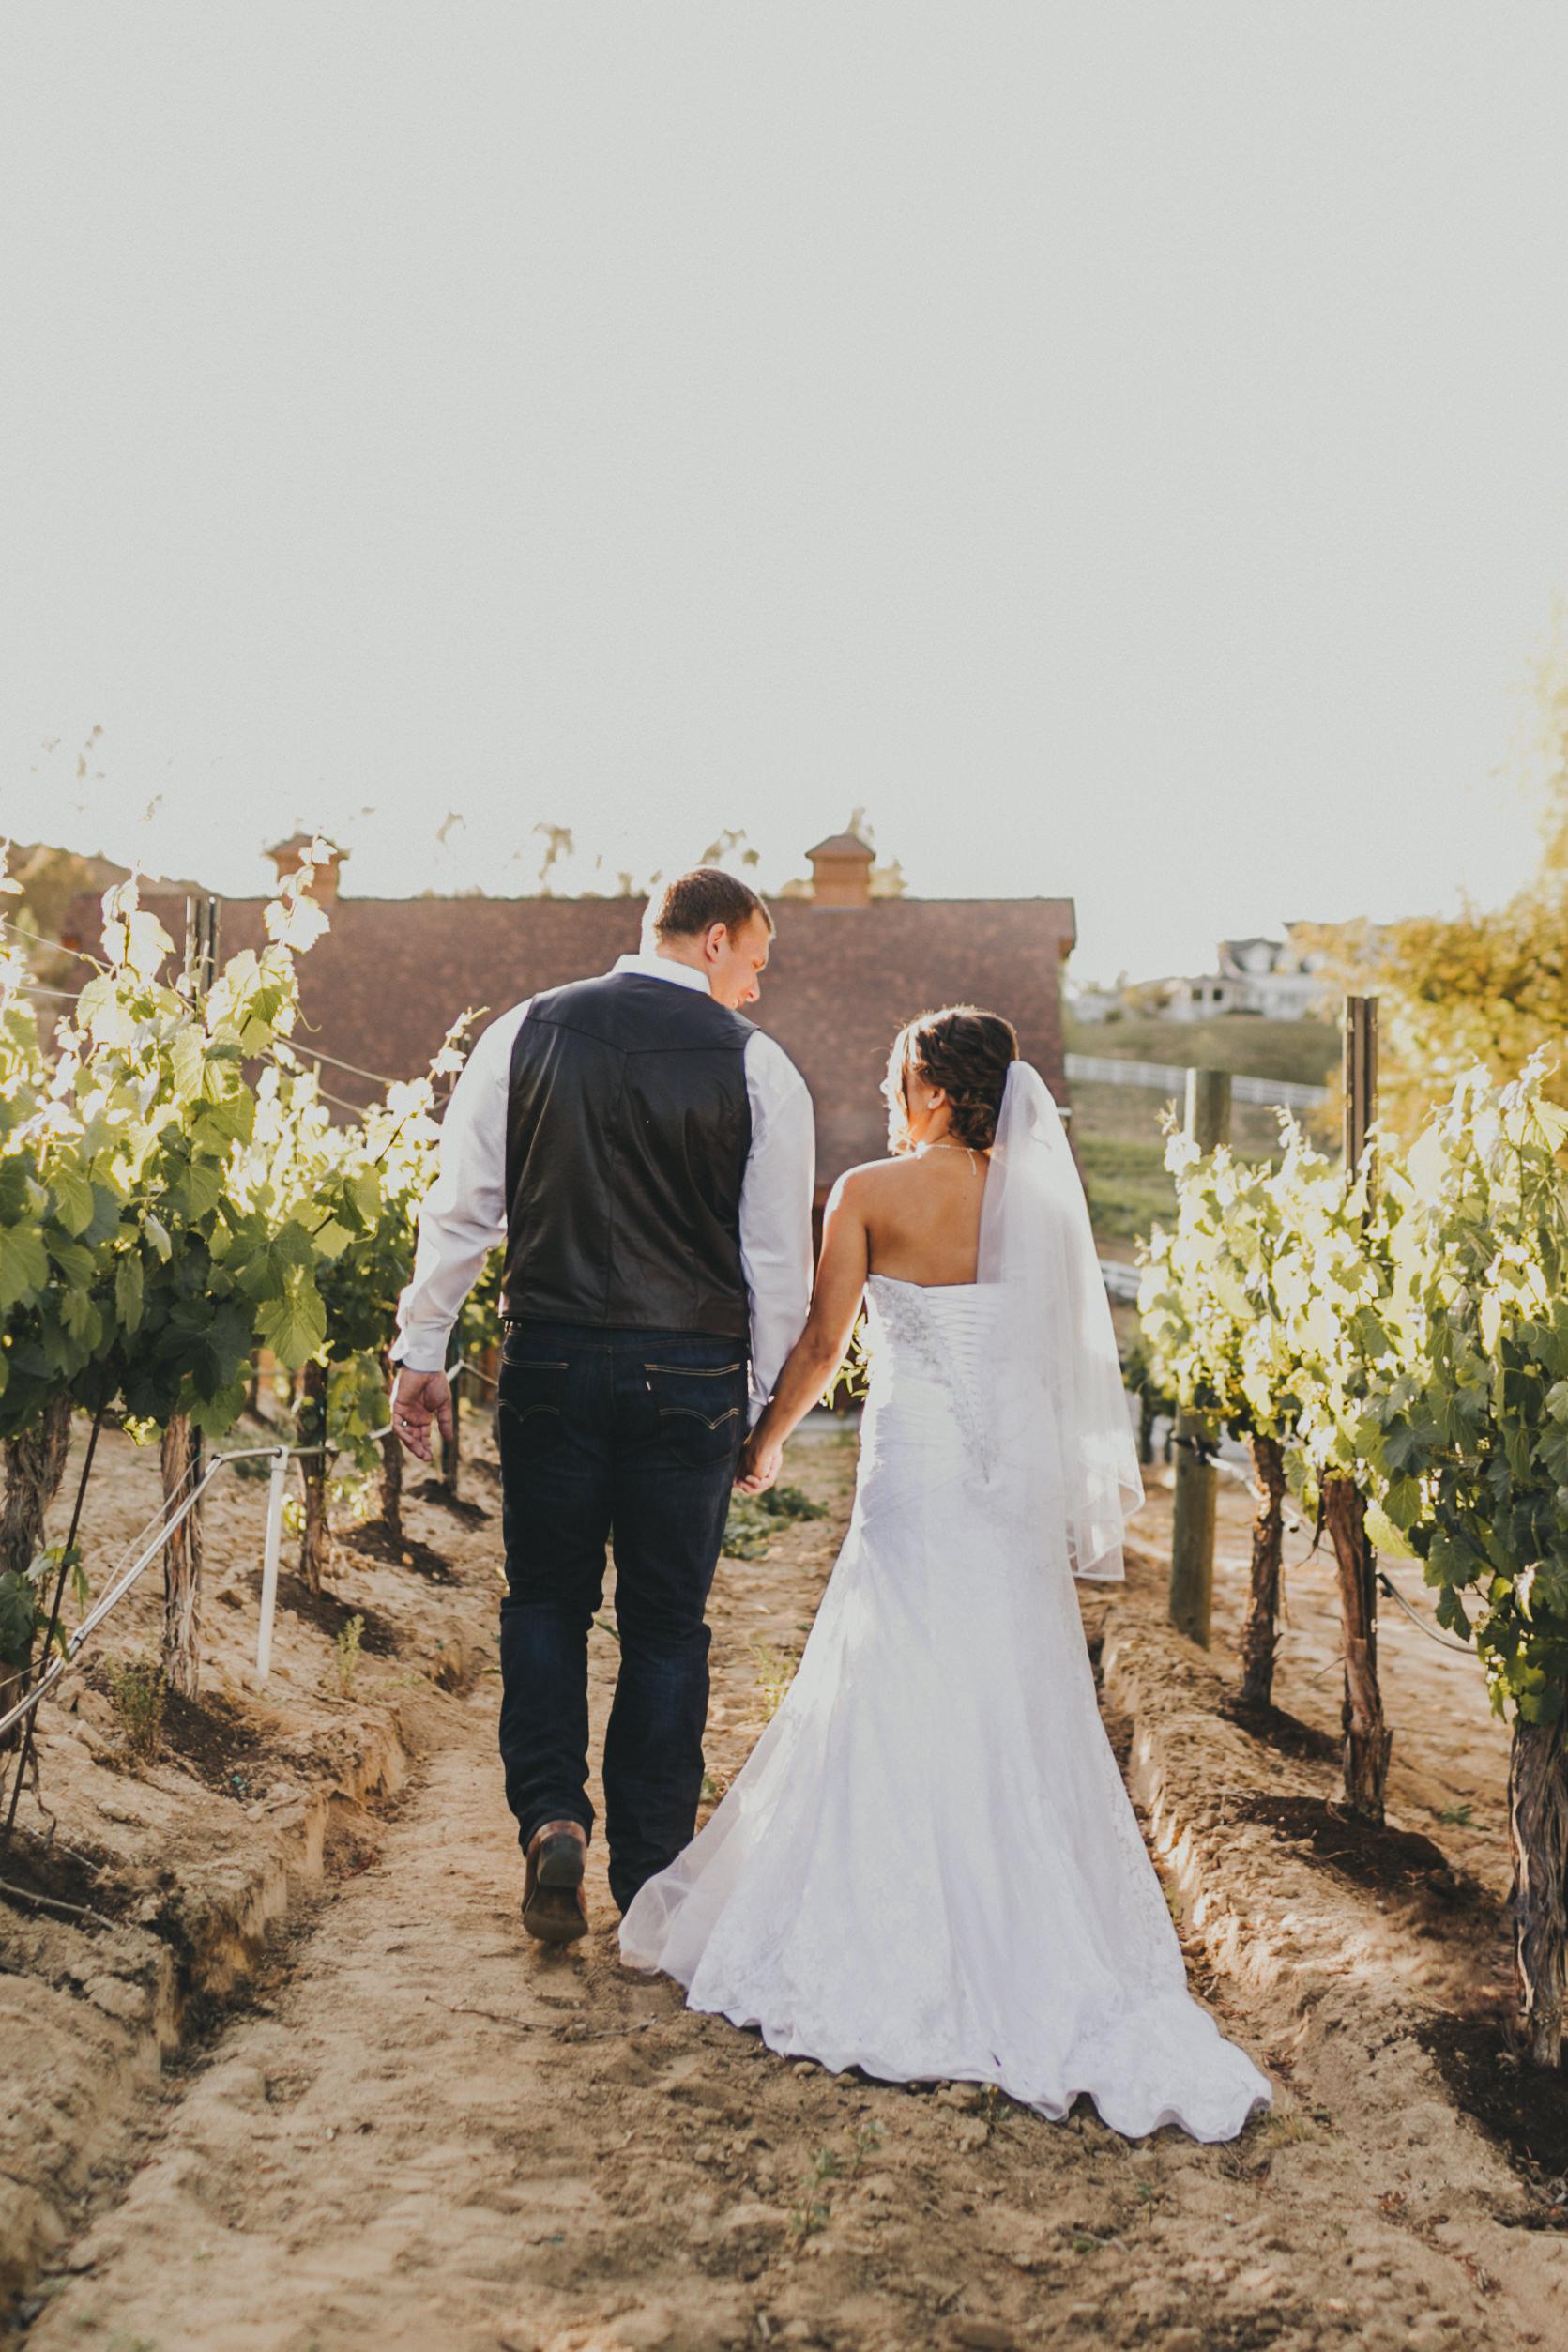 Cheyenne + Jordan - Wedding, Natalie Griffo (75 of 157).jpg